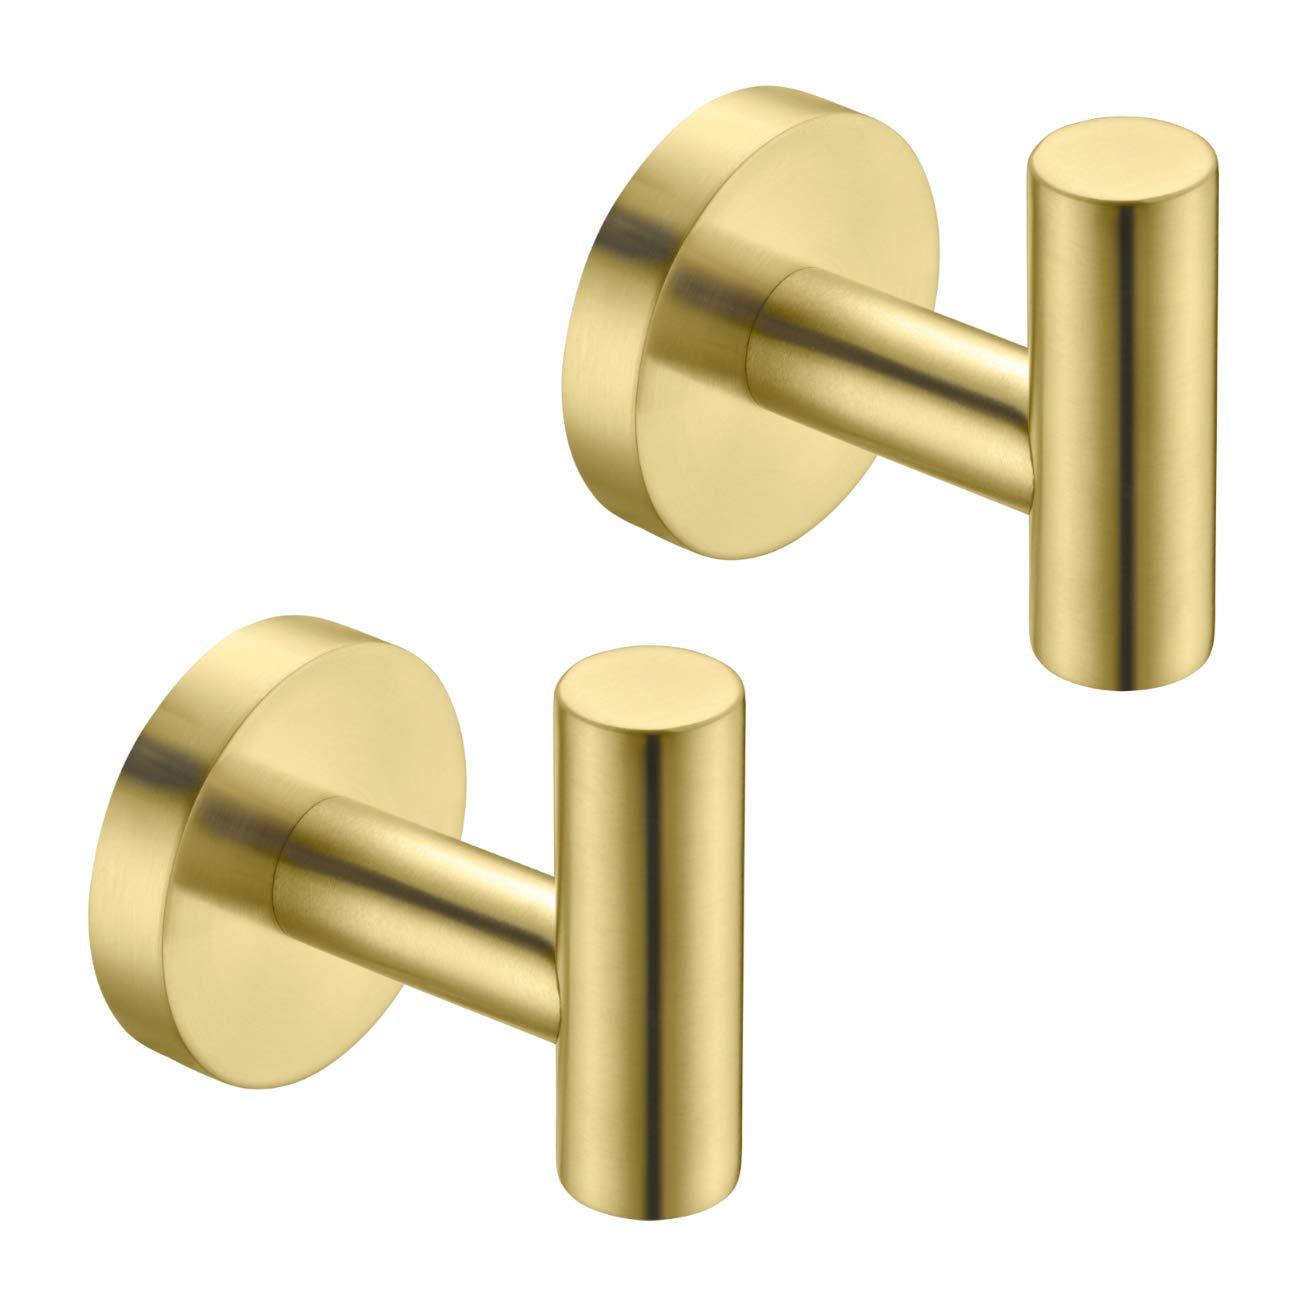 Hoooh Bath Towel Hook - Bathroom Lavatory Wall Mount Single Coat and Robe Hook SUS304 Stainless Steel 2 Pack, Brushed Gold, B100-BG-P2